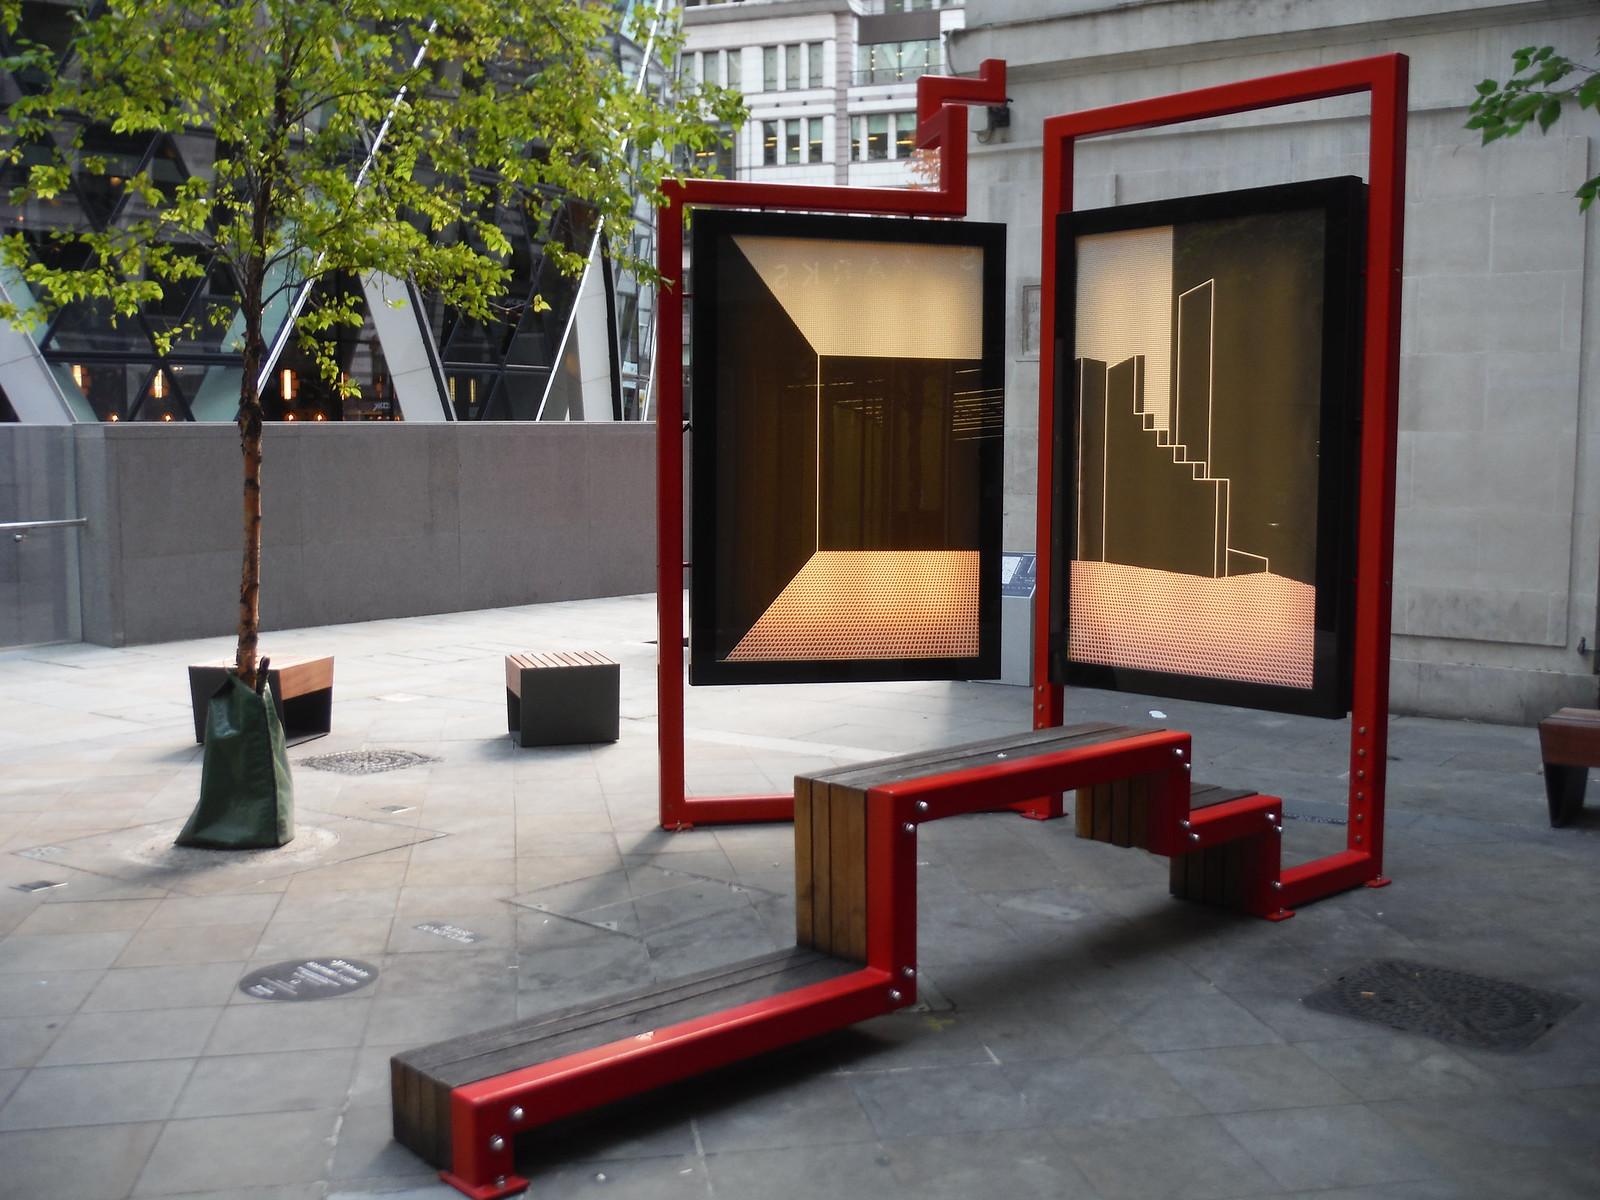 Gabriel Lester- The Adventurer SWC Walk Short 24 - Sculpture in the City